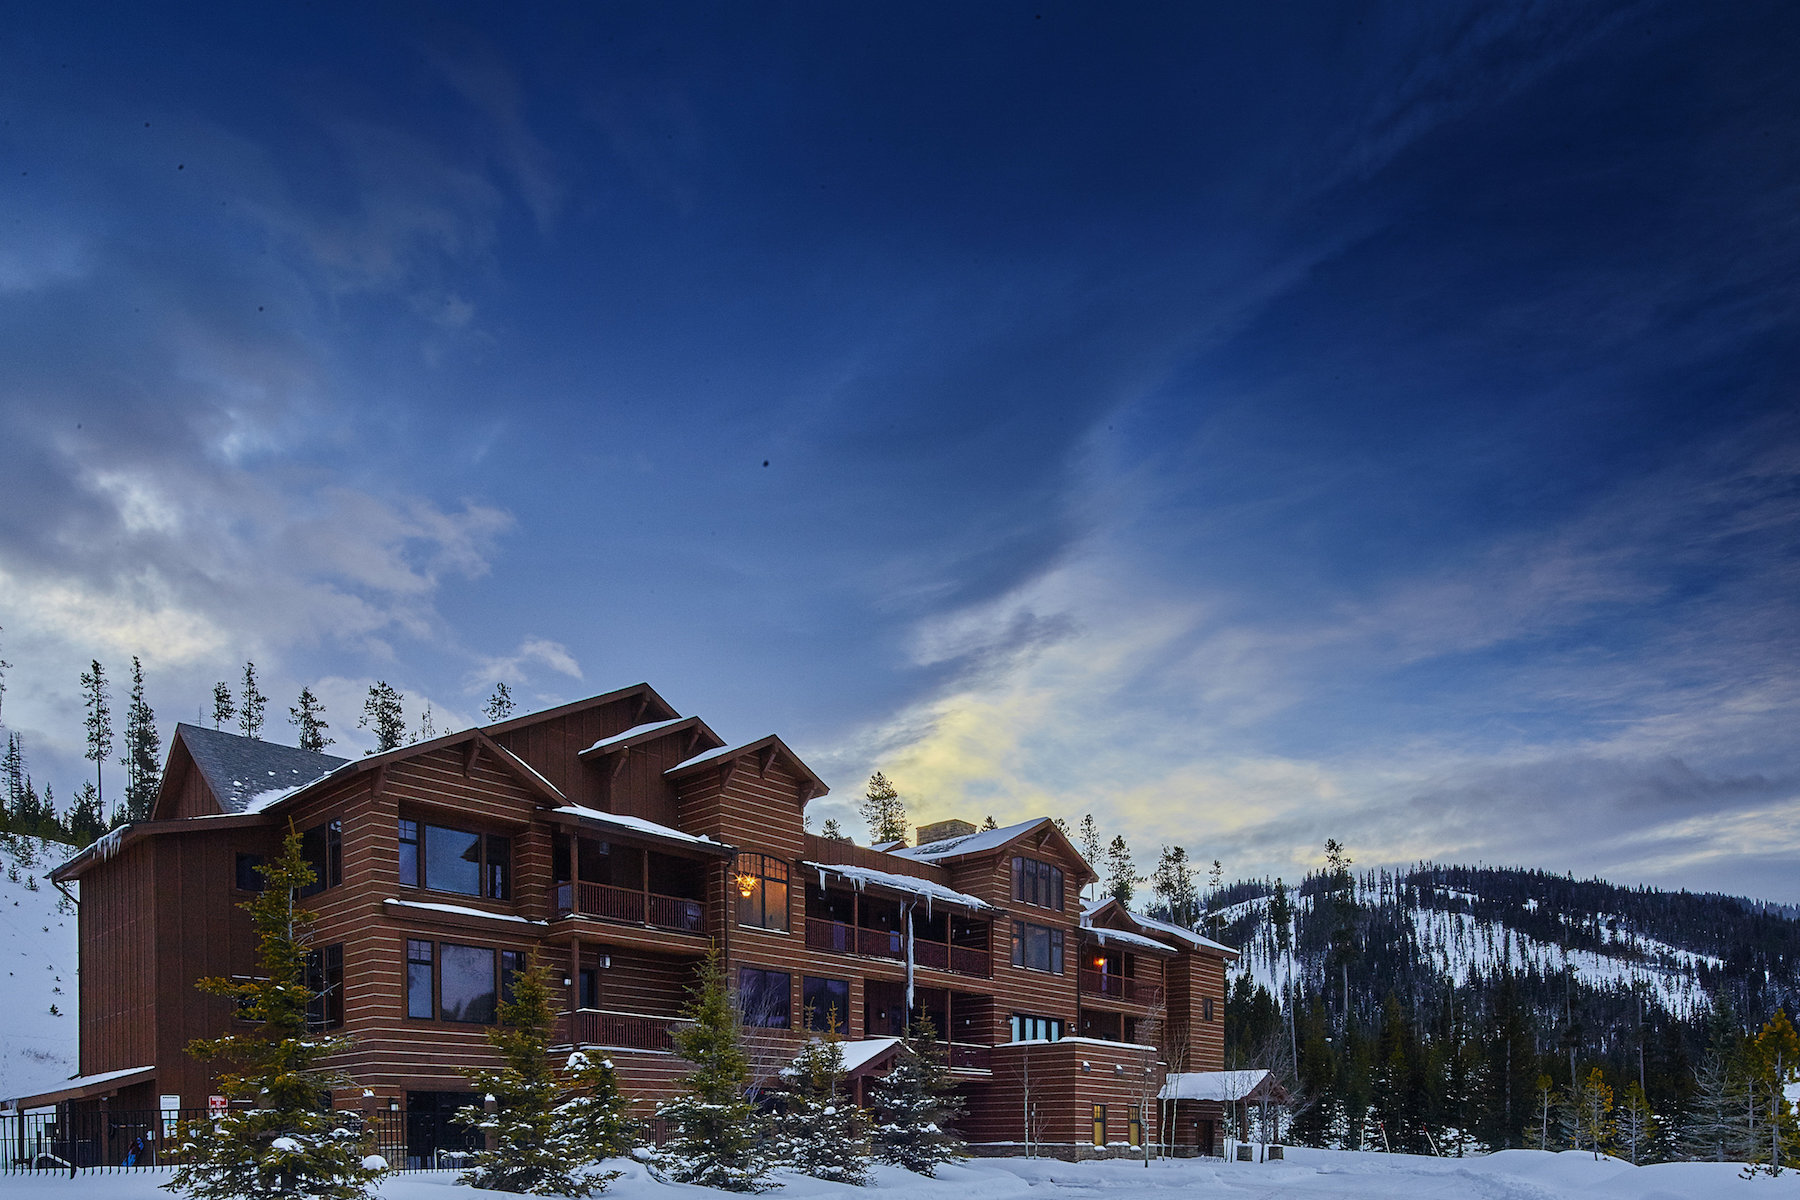 Кооперативная квартира для того Продажа на Mountain Lake Ski Condo 2 Summit View Drive Unit 303 PH1 Big Sky, Монтана 59716 Соединенные Штаты